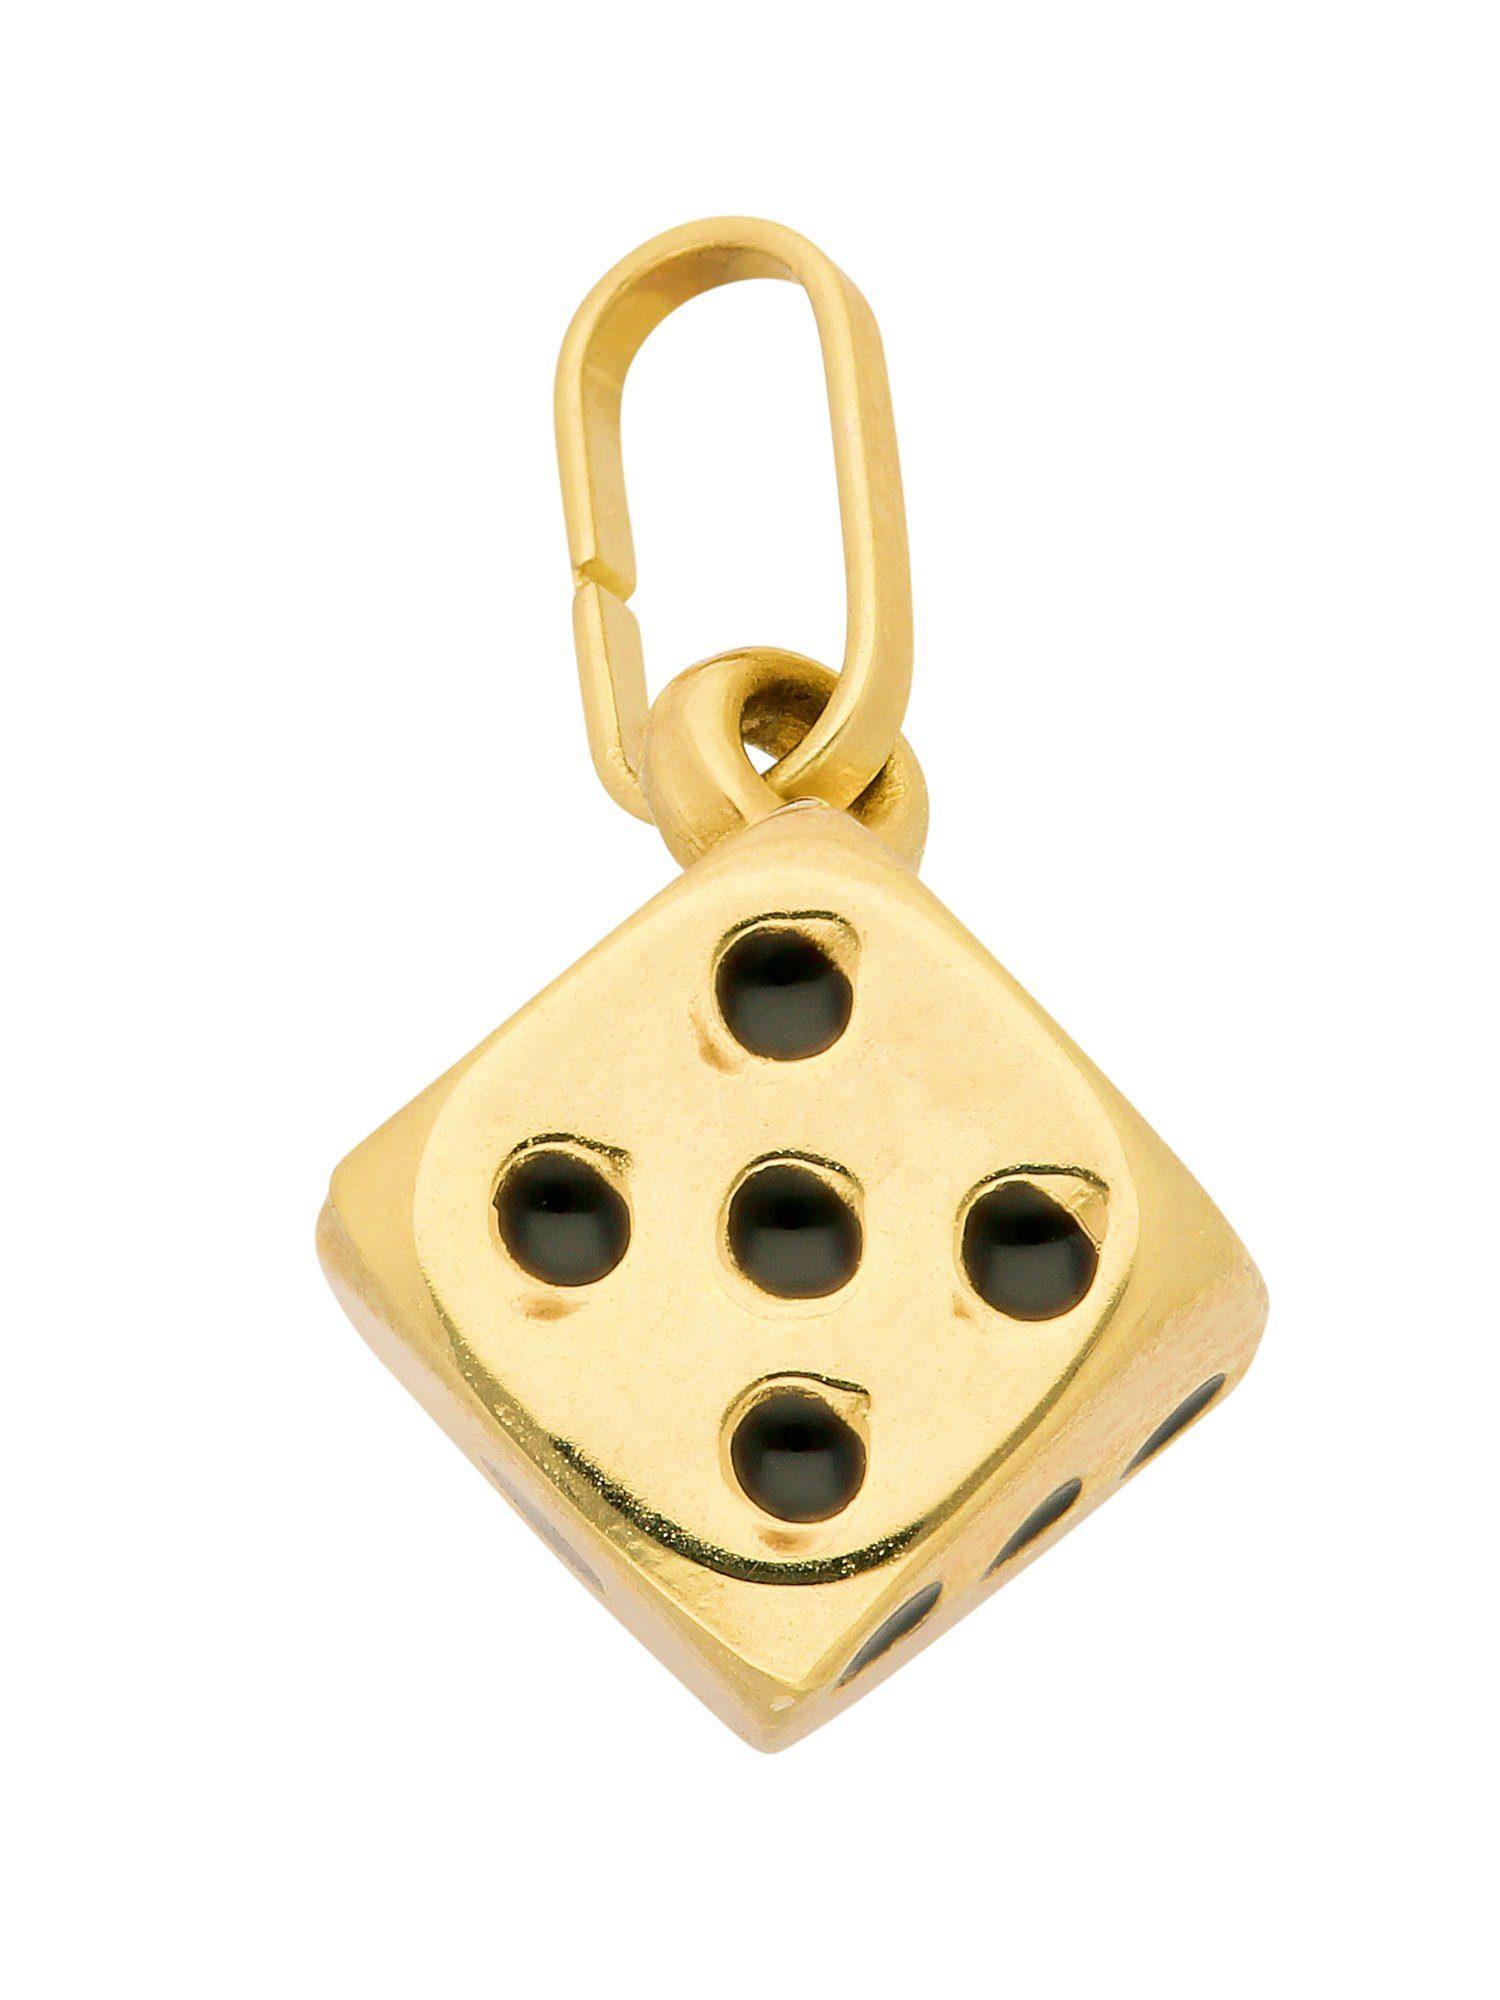 Adelia´s Kettenanhänger »Gold Anhänger« Würfel 14 k 585 Gelbgold